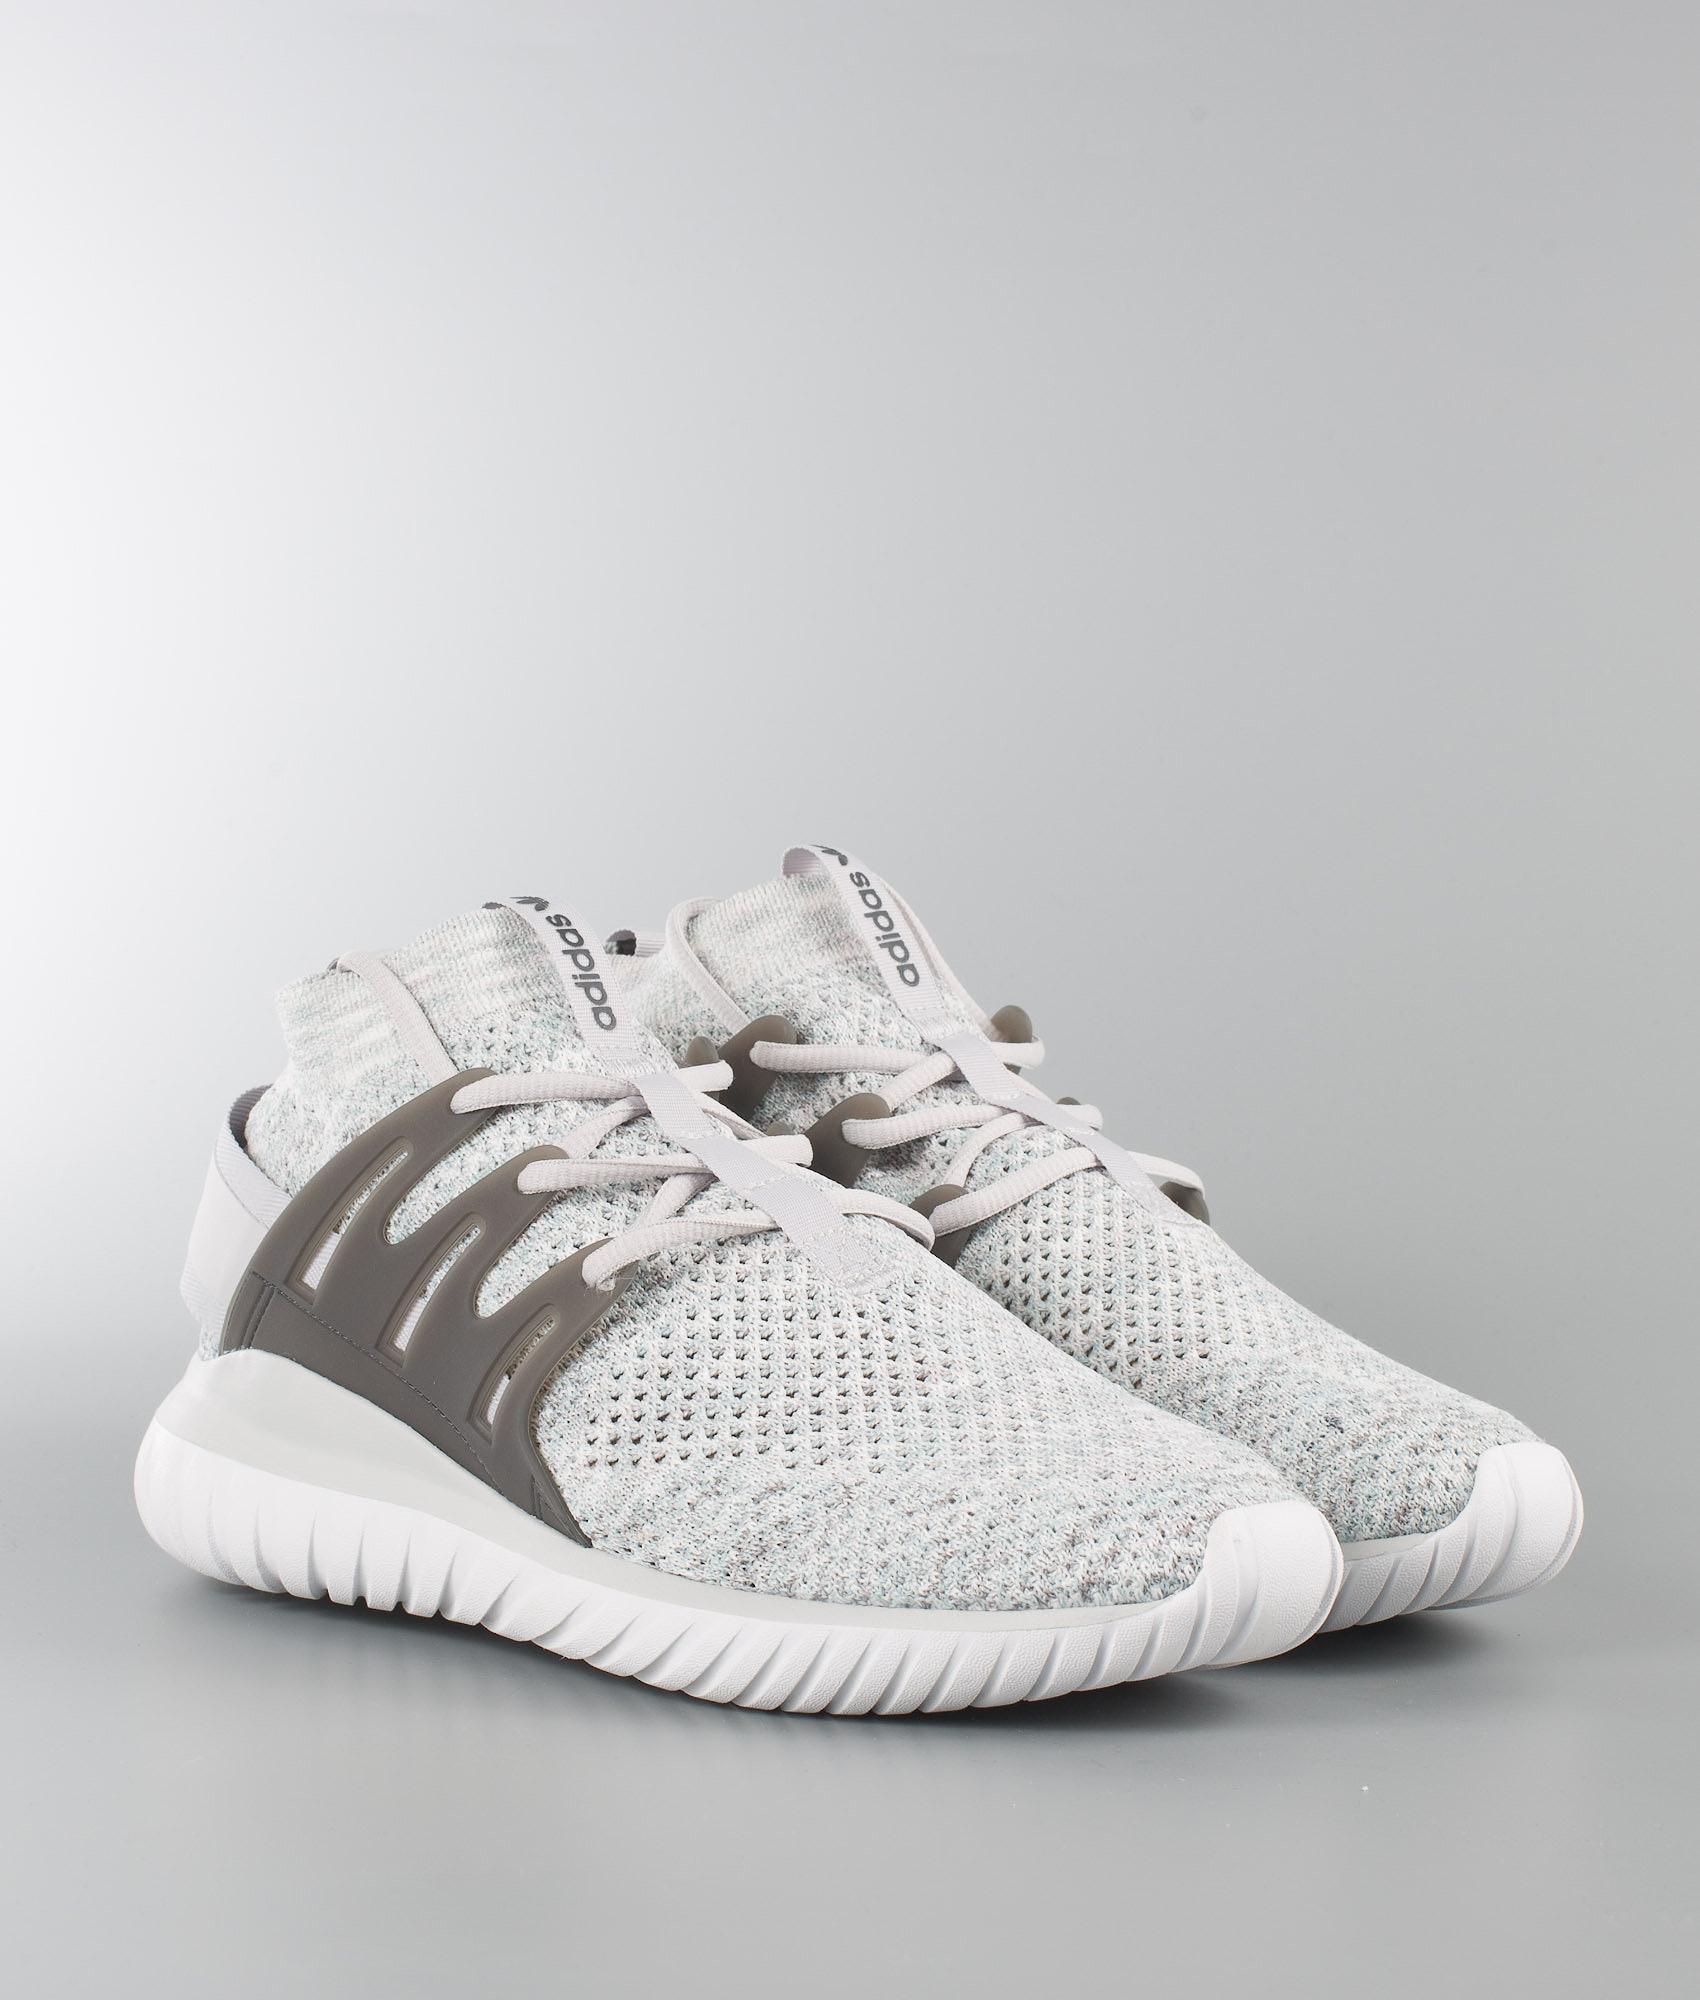 newest 029f5 04dd8 Adidas Originals Tubular Nova Primeknit Shoes